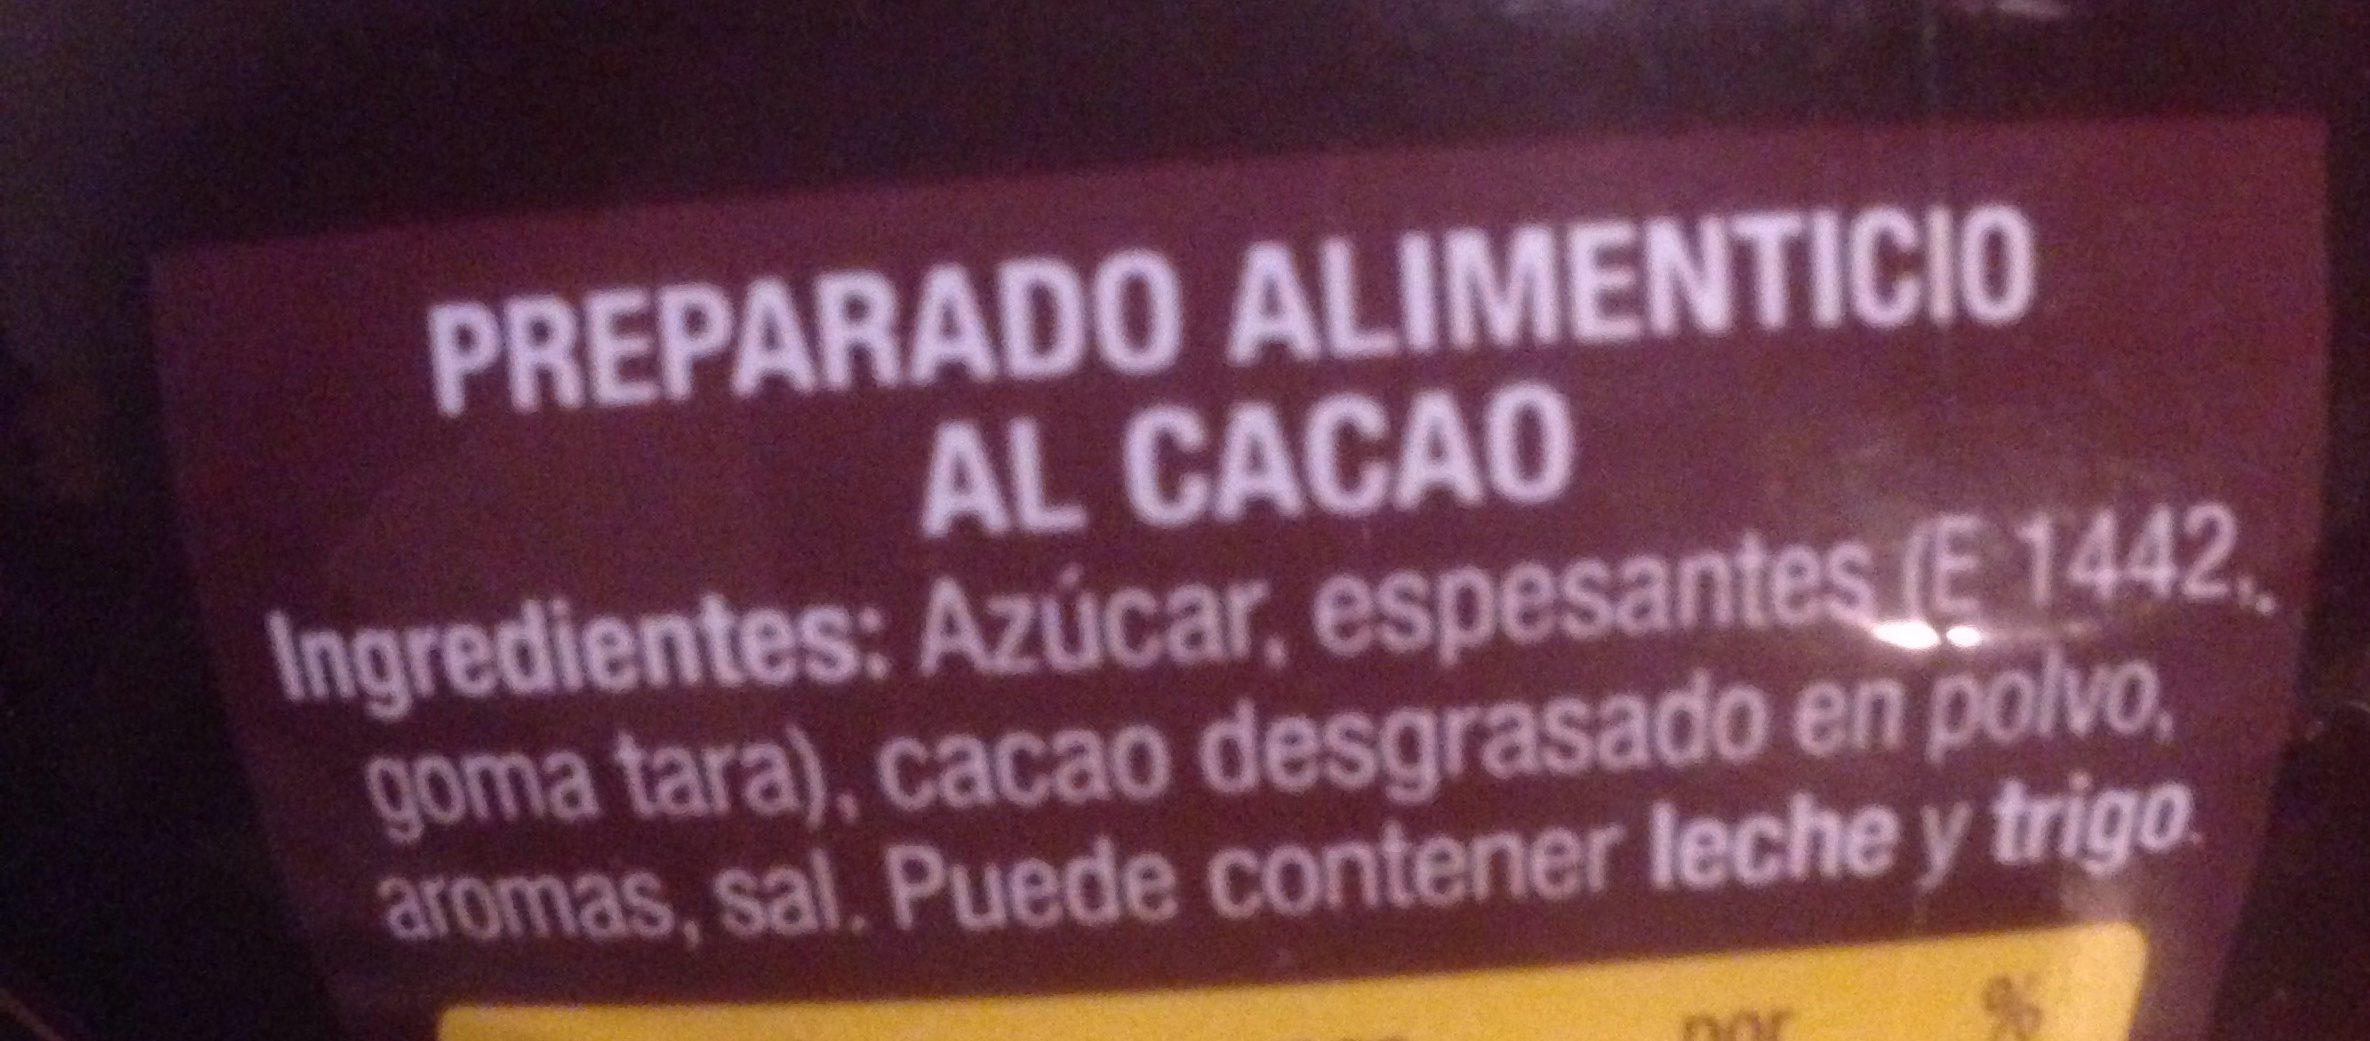 Paladin - Trinkschokolade / Paladin - 500 g - Ingredientes